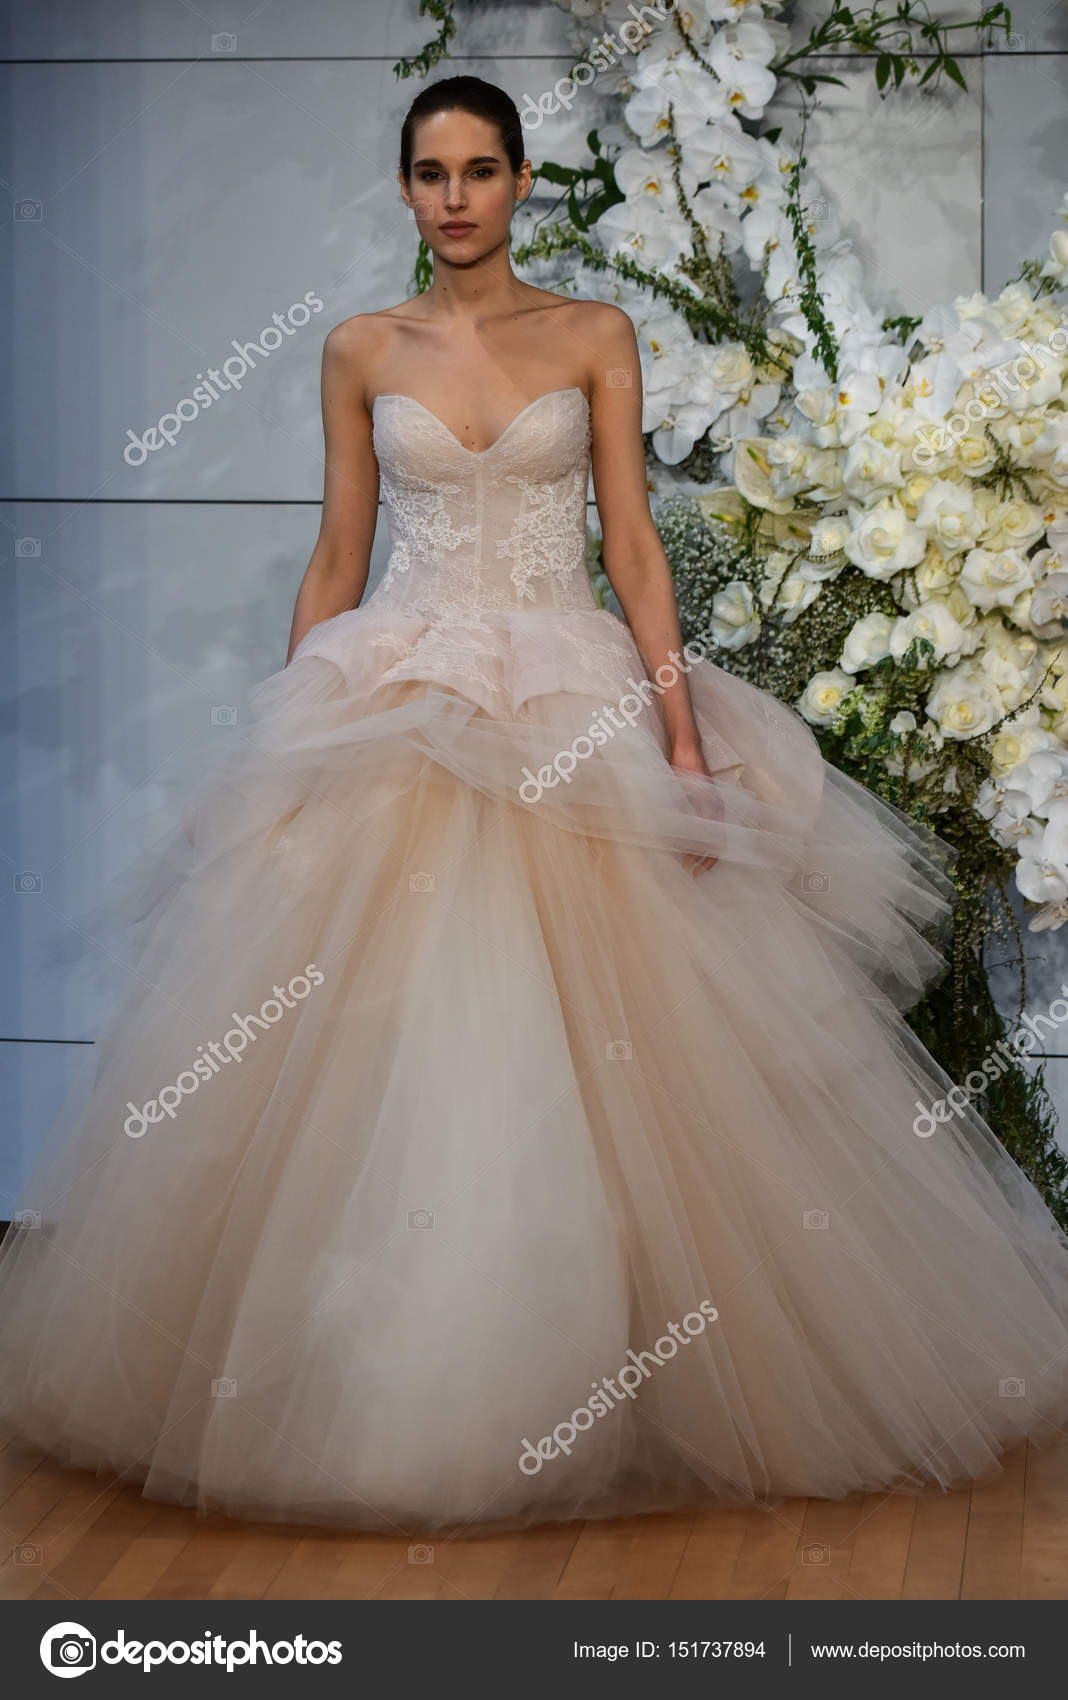 Show de monique lhuillier bridal fotografia de stock editorial show de monique lhuillier bridal fotografia de stock junglespirit Images